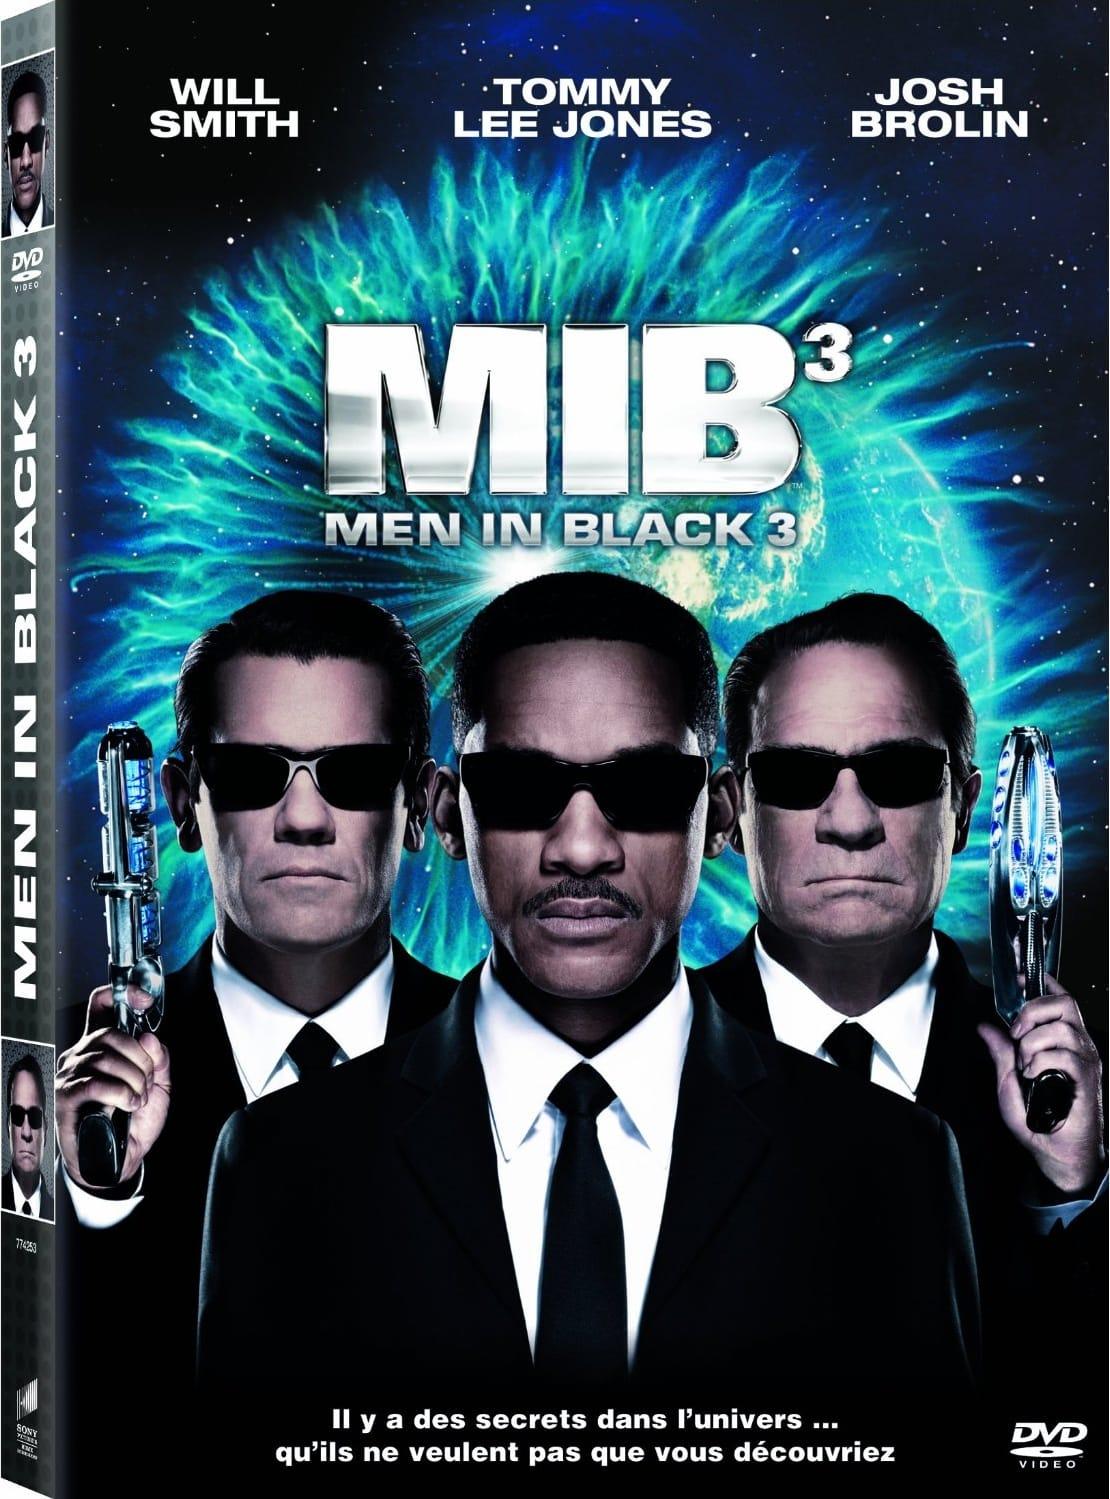 Hombres De Negro 3 (2012) DVDR NTSC Español Latino - In...